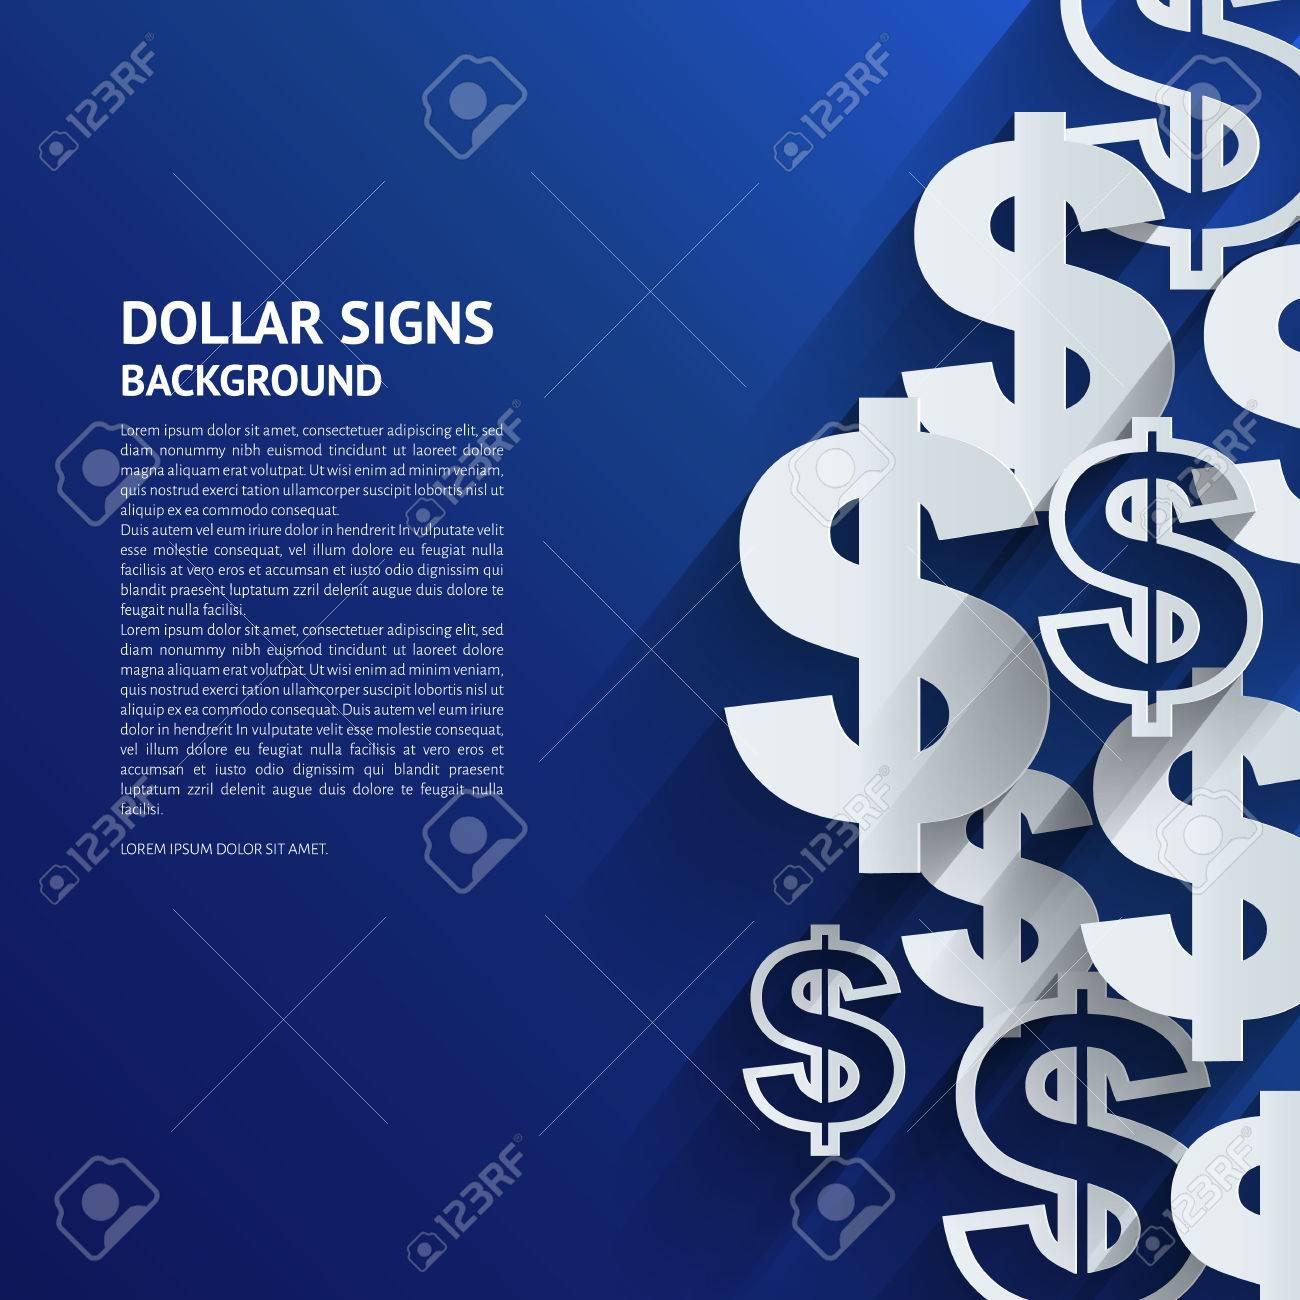 Vector illustration. Dollar signs on blue background. - 31689921